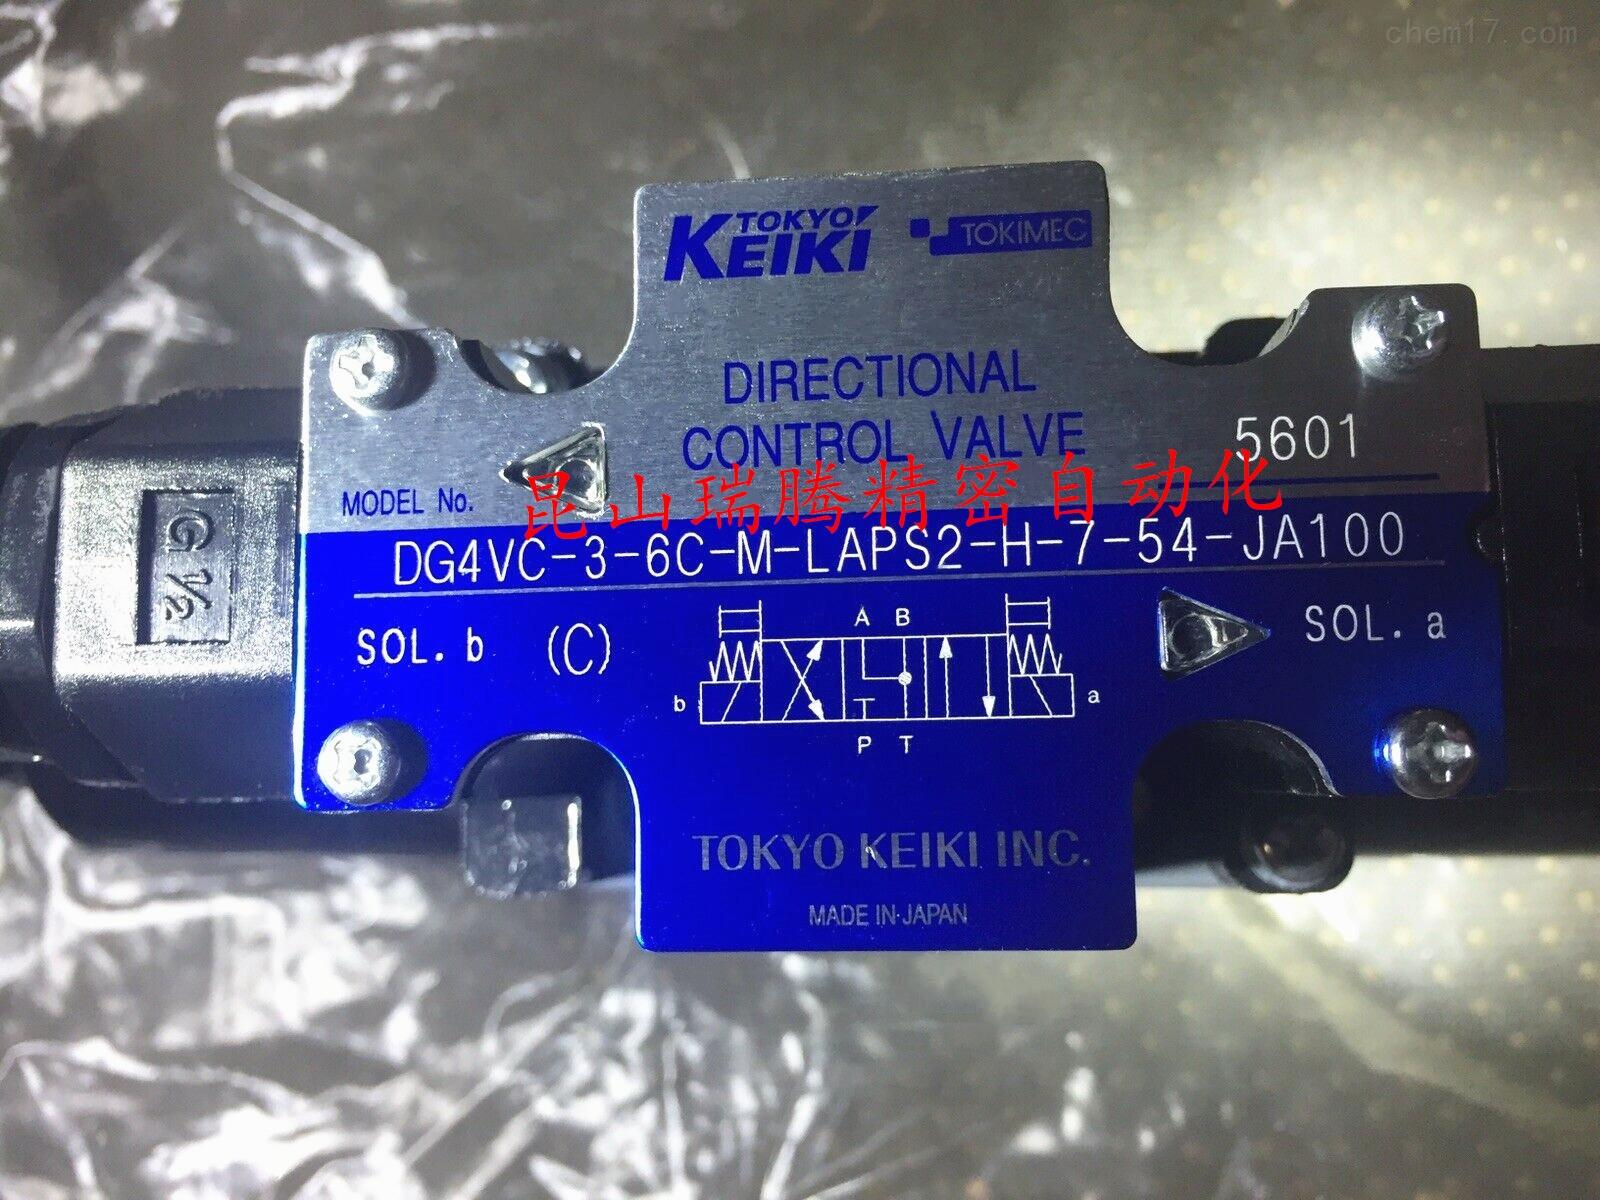 DG4VC-3-6C-M-LAPS2-H-7-54-JA100电磁阀